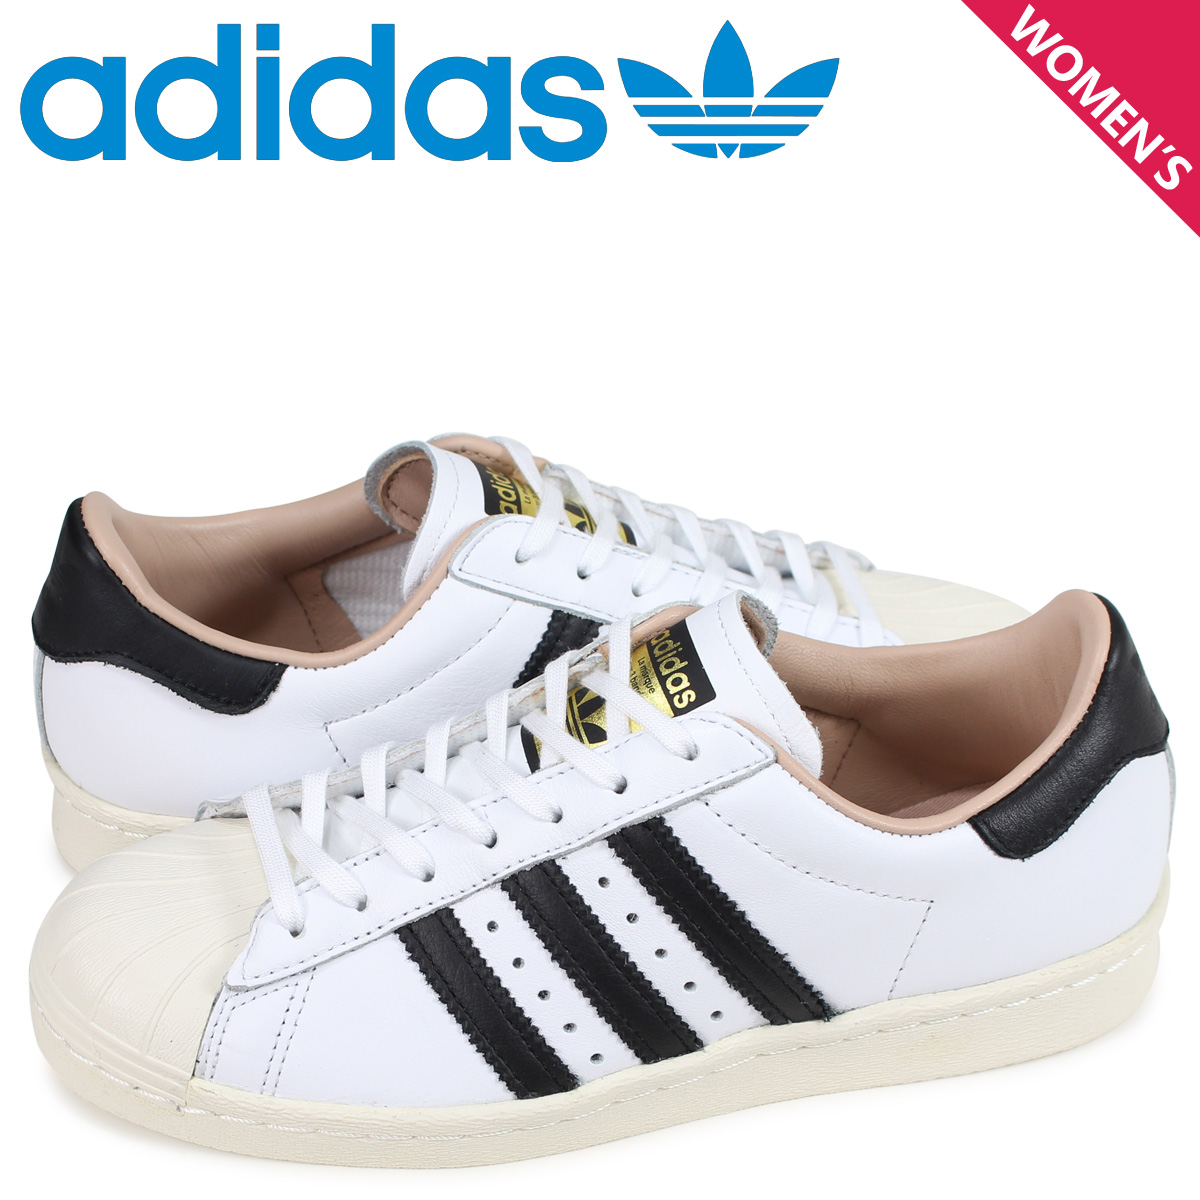 C77124 Superstar W//B Men Adidas